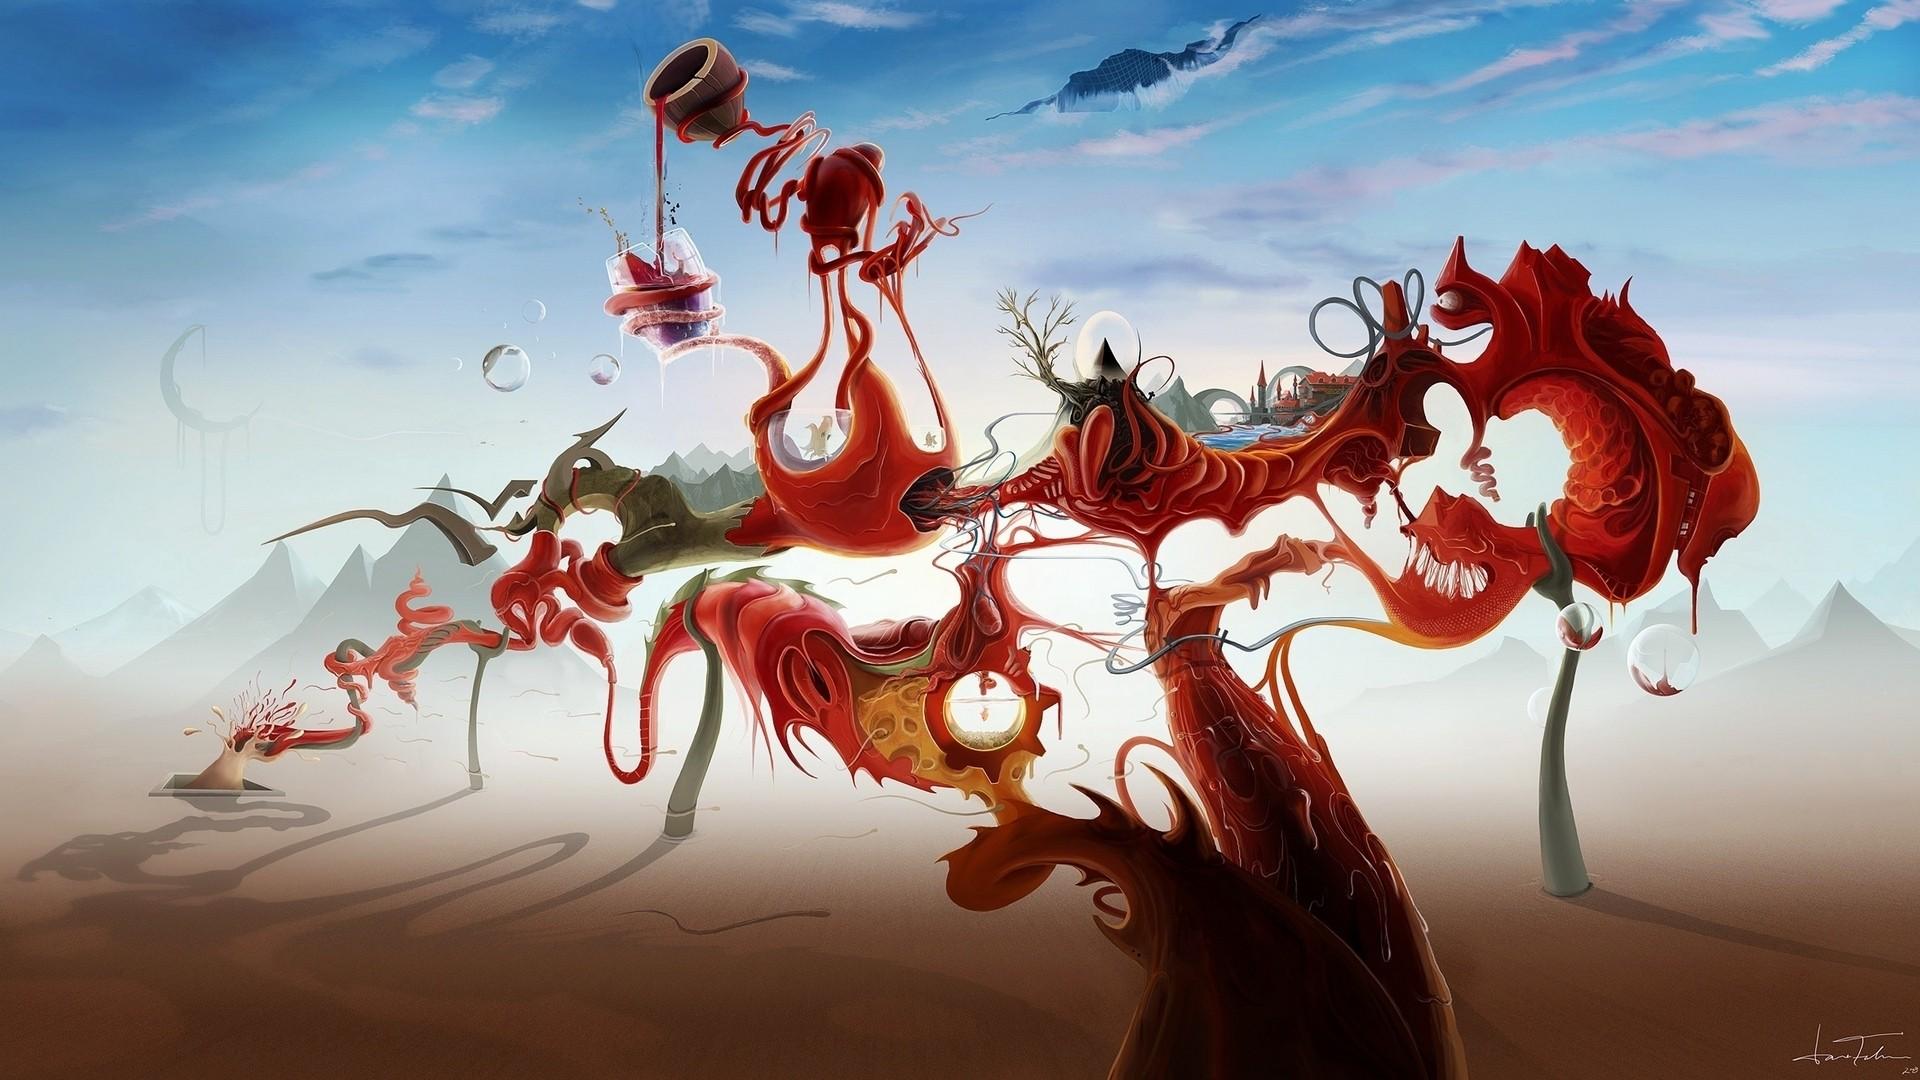 Surreal Wallpaper Pic